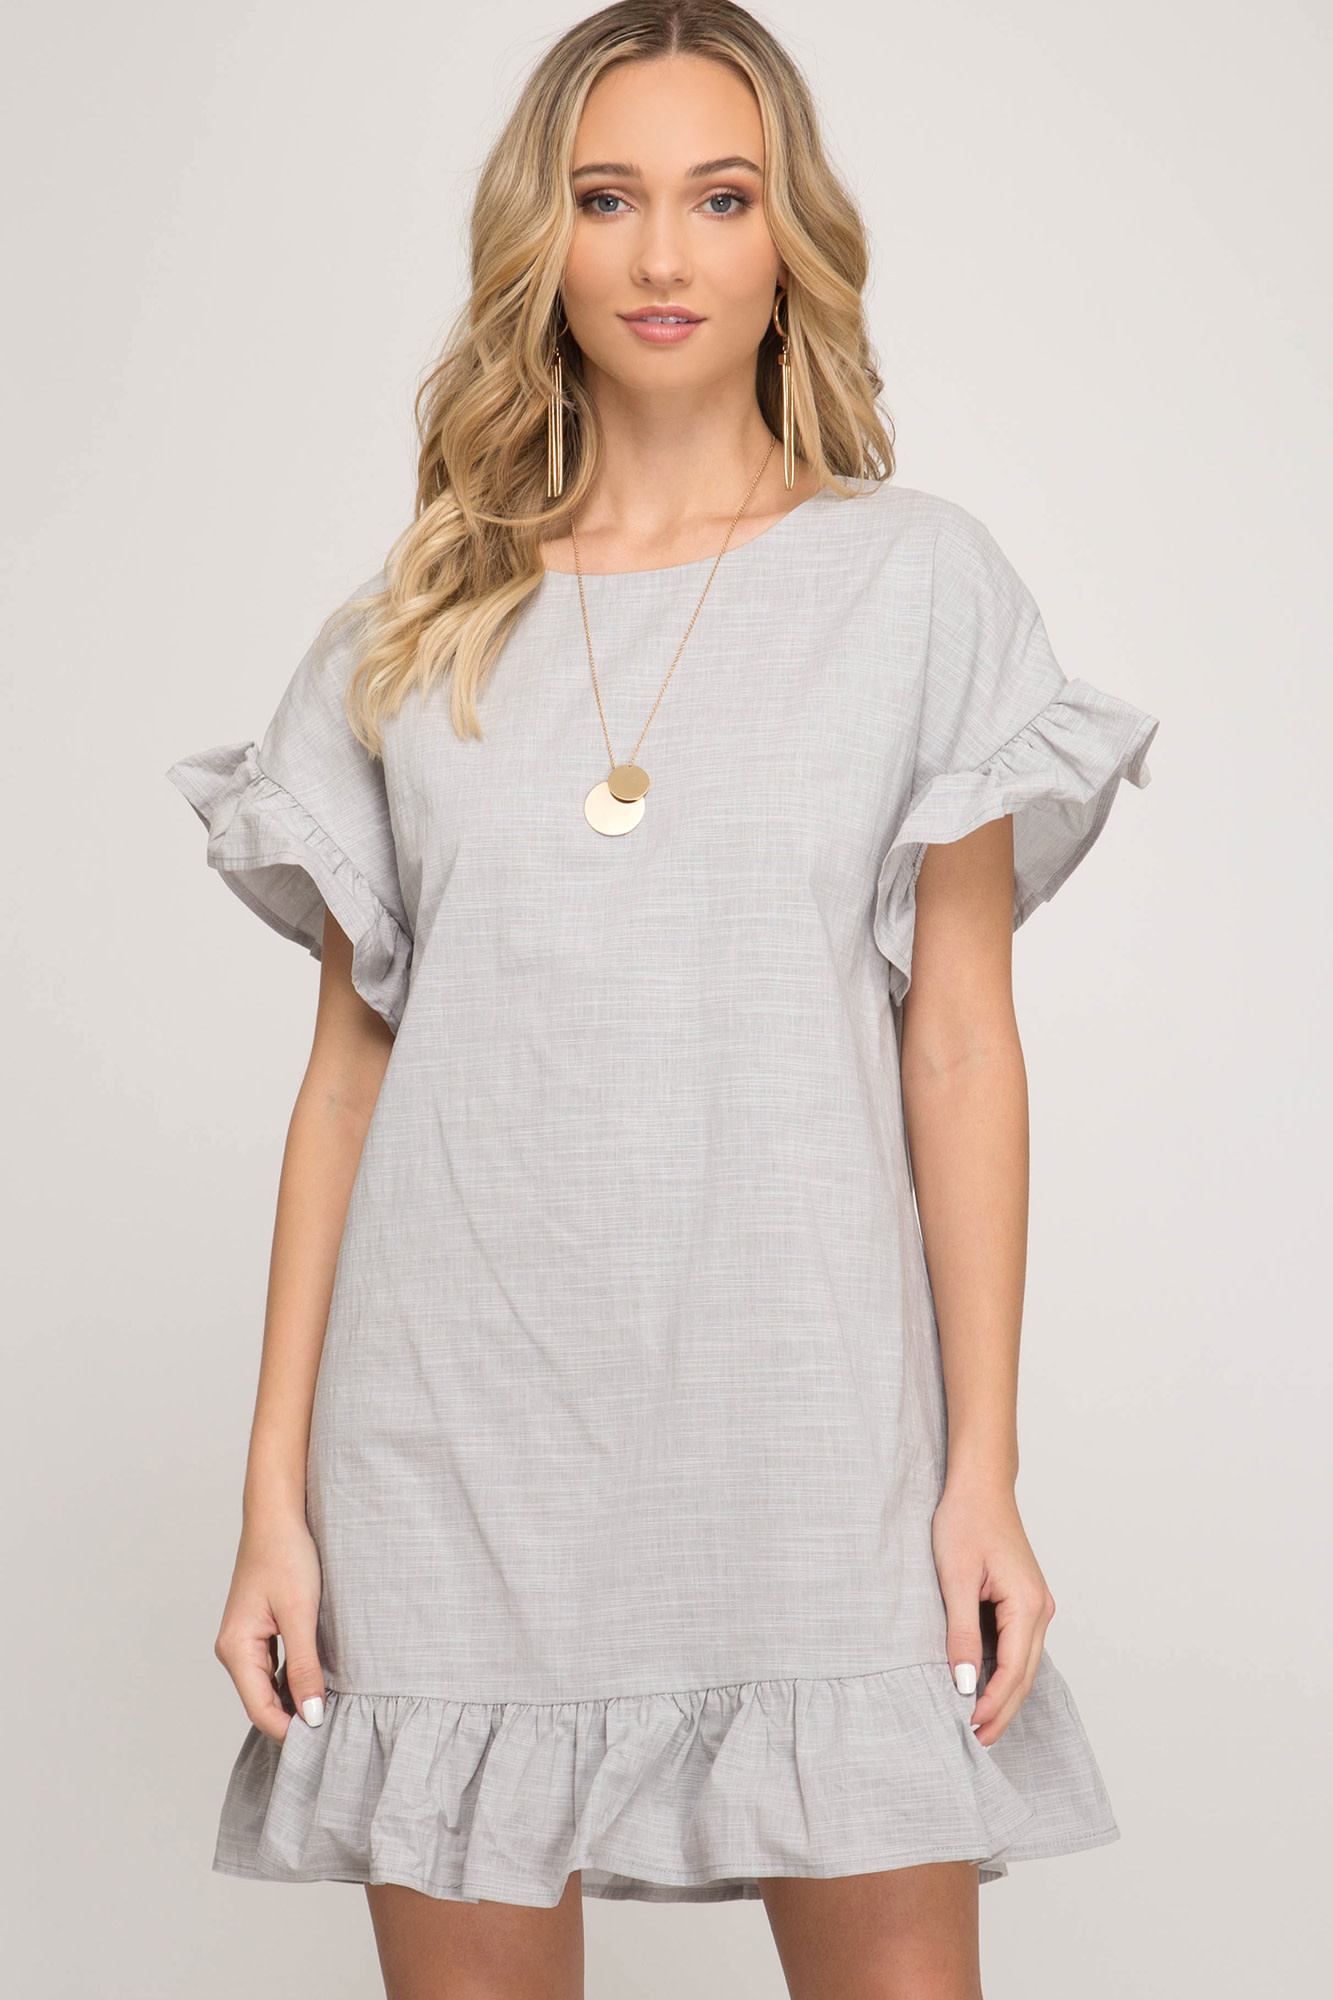 SS dress w/ruffled sleeve & hem